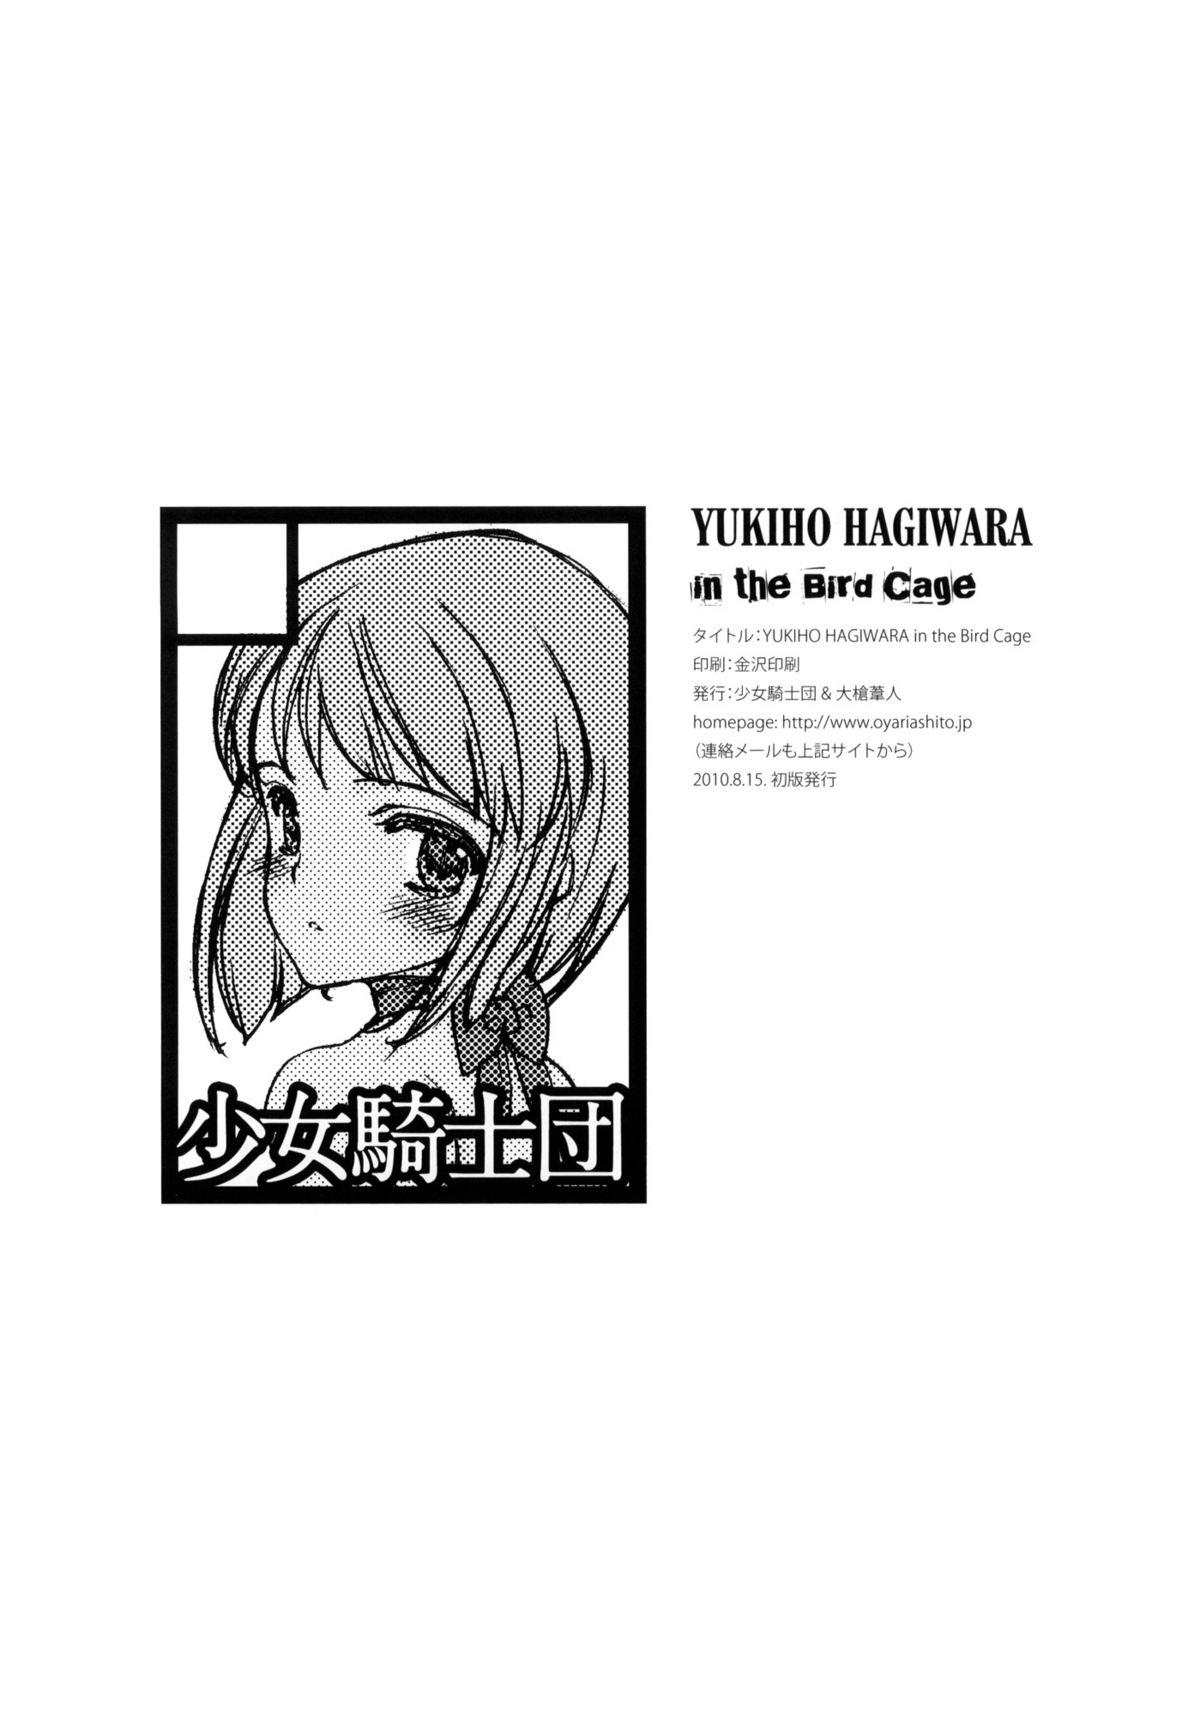 IDOLTIME SPECIAL BOOK YUKIHO HAGIWARA in the Bird Cage 39